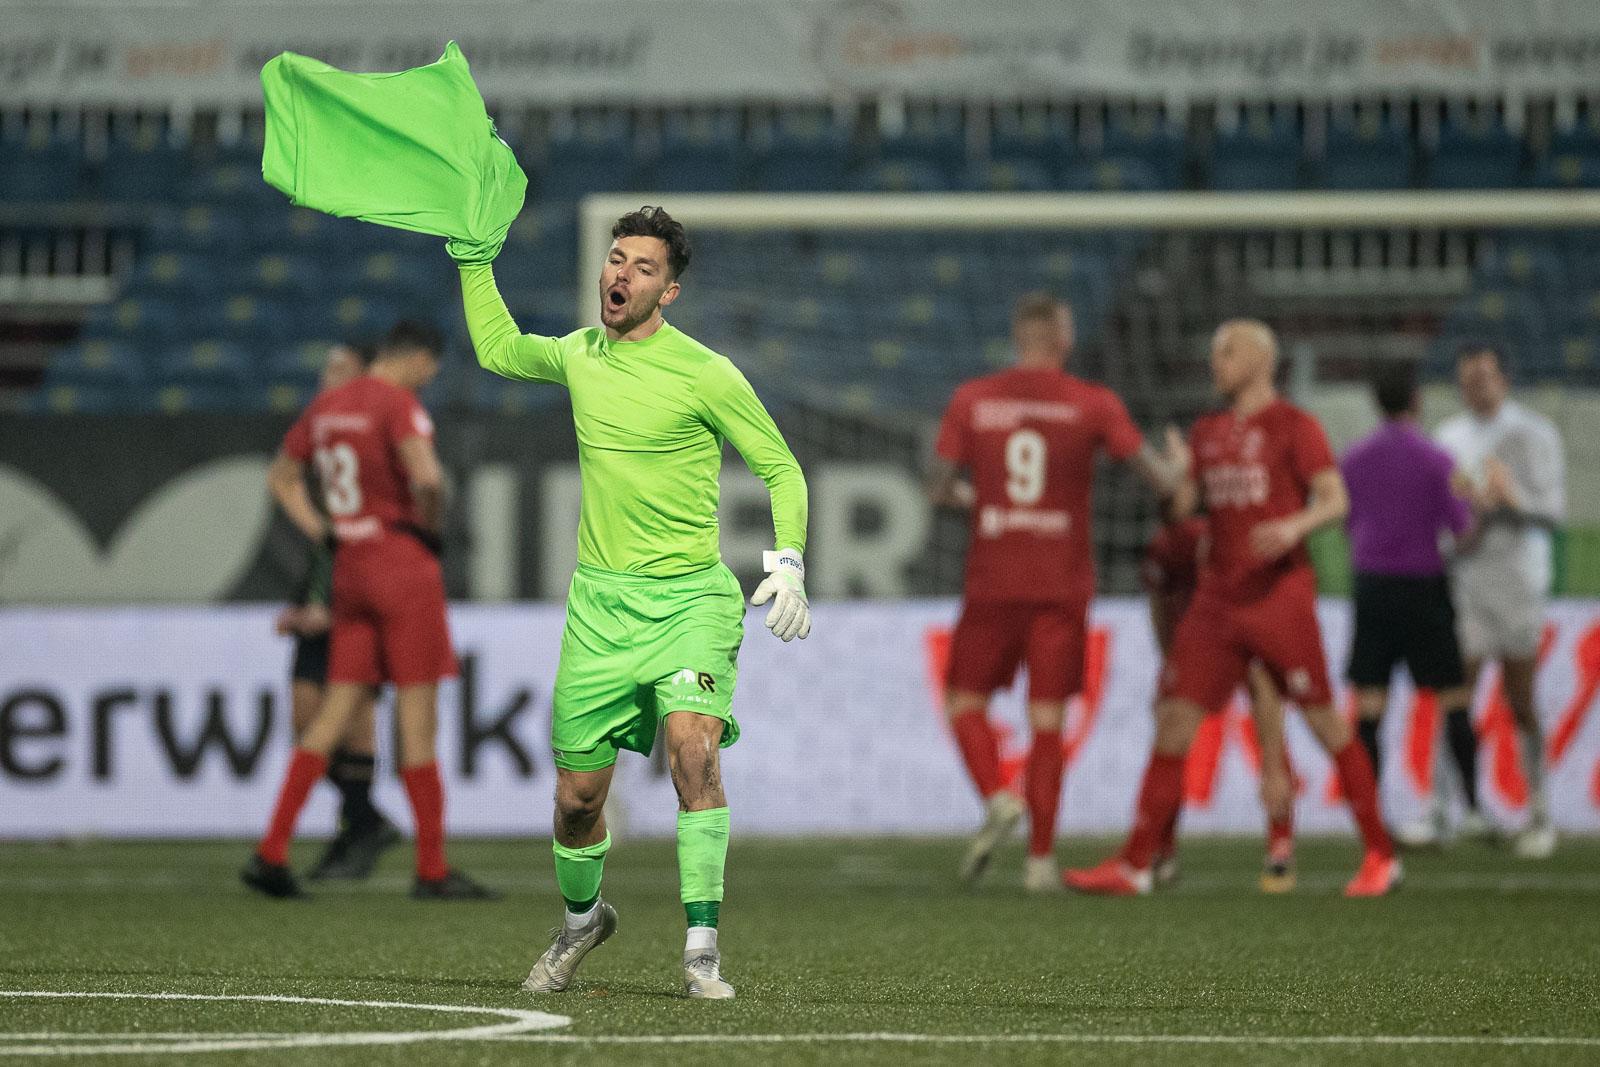 Almere City FC speelt #Alltogetherchallenge uit